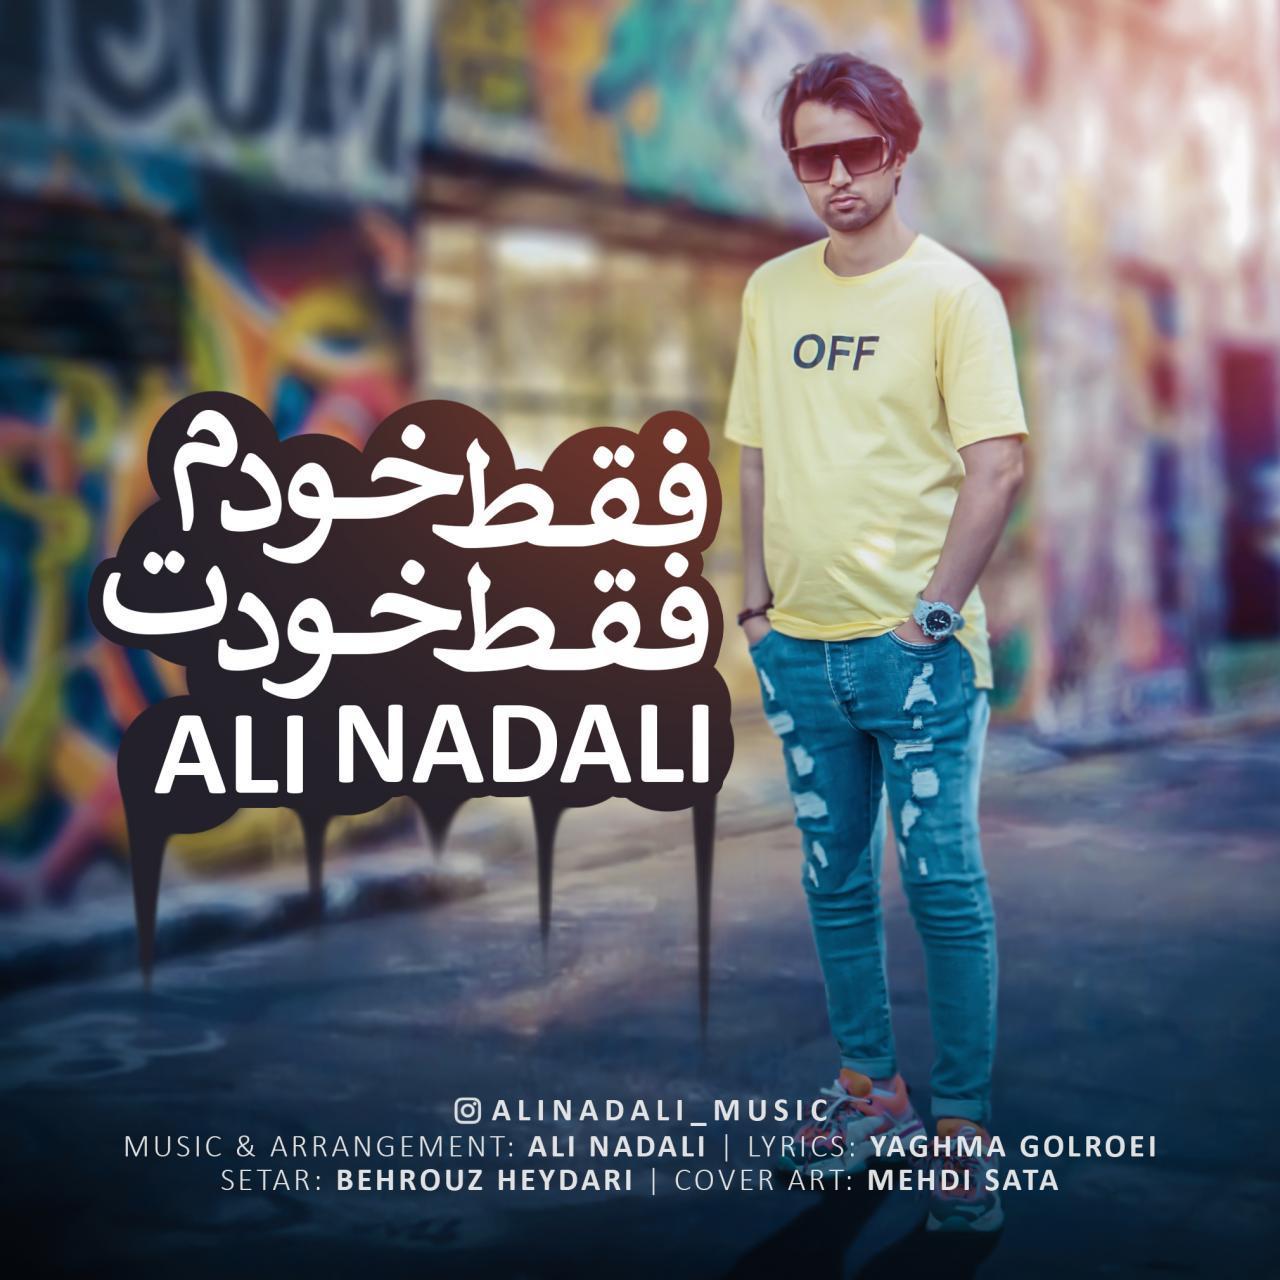 Ali Nadali – Faghat Khodam Faghat Khodet